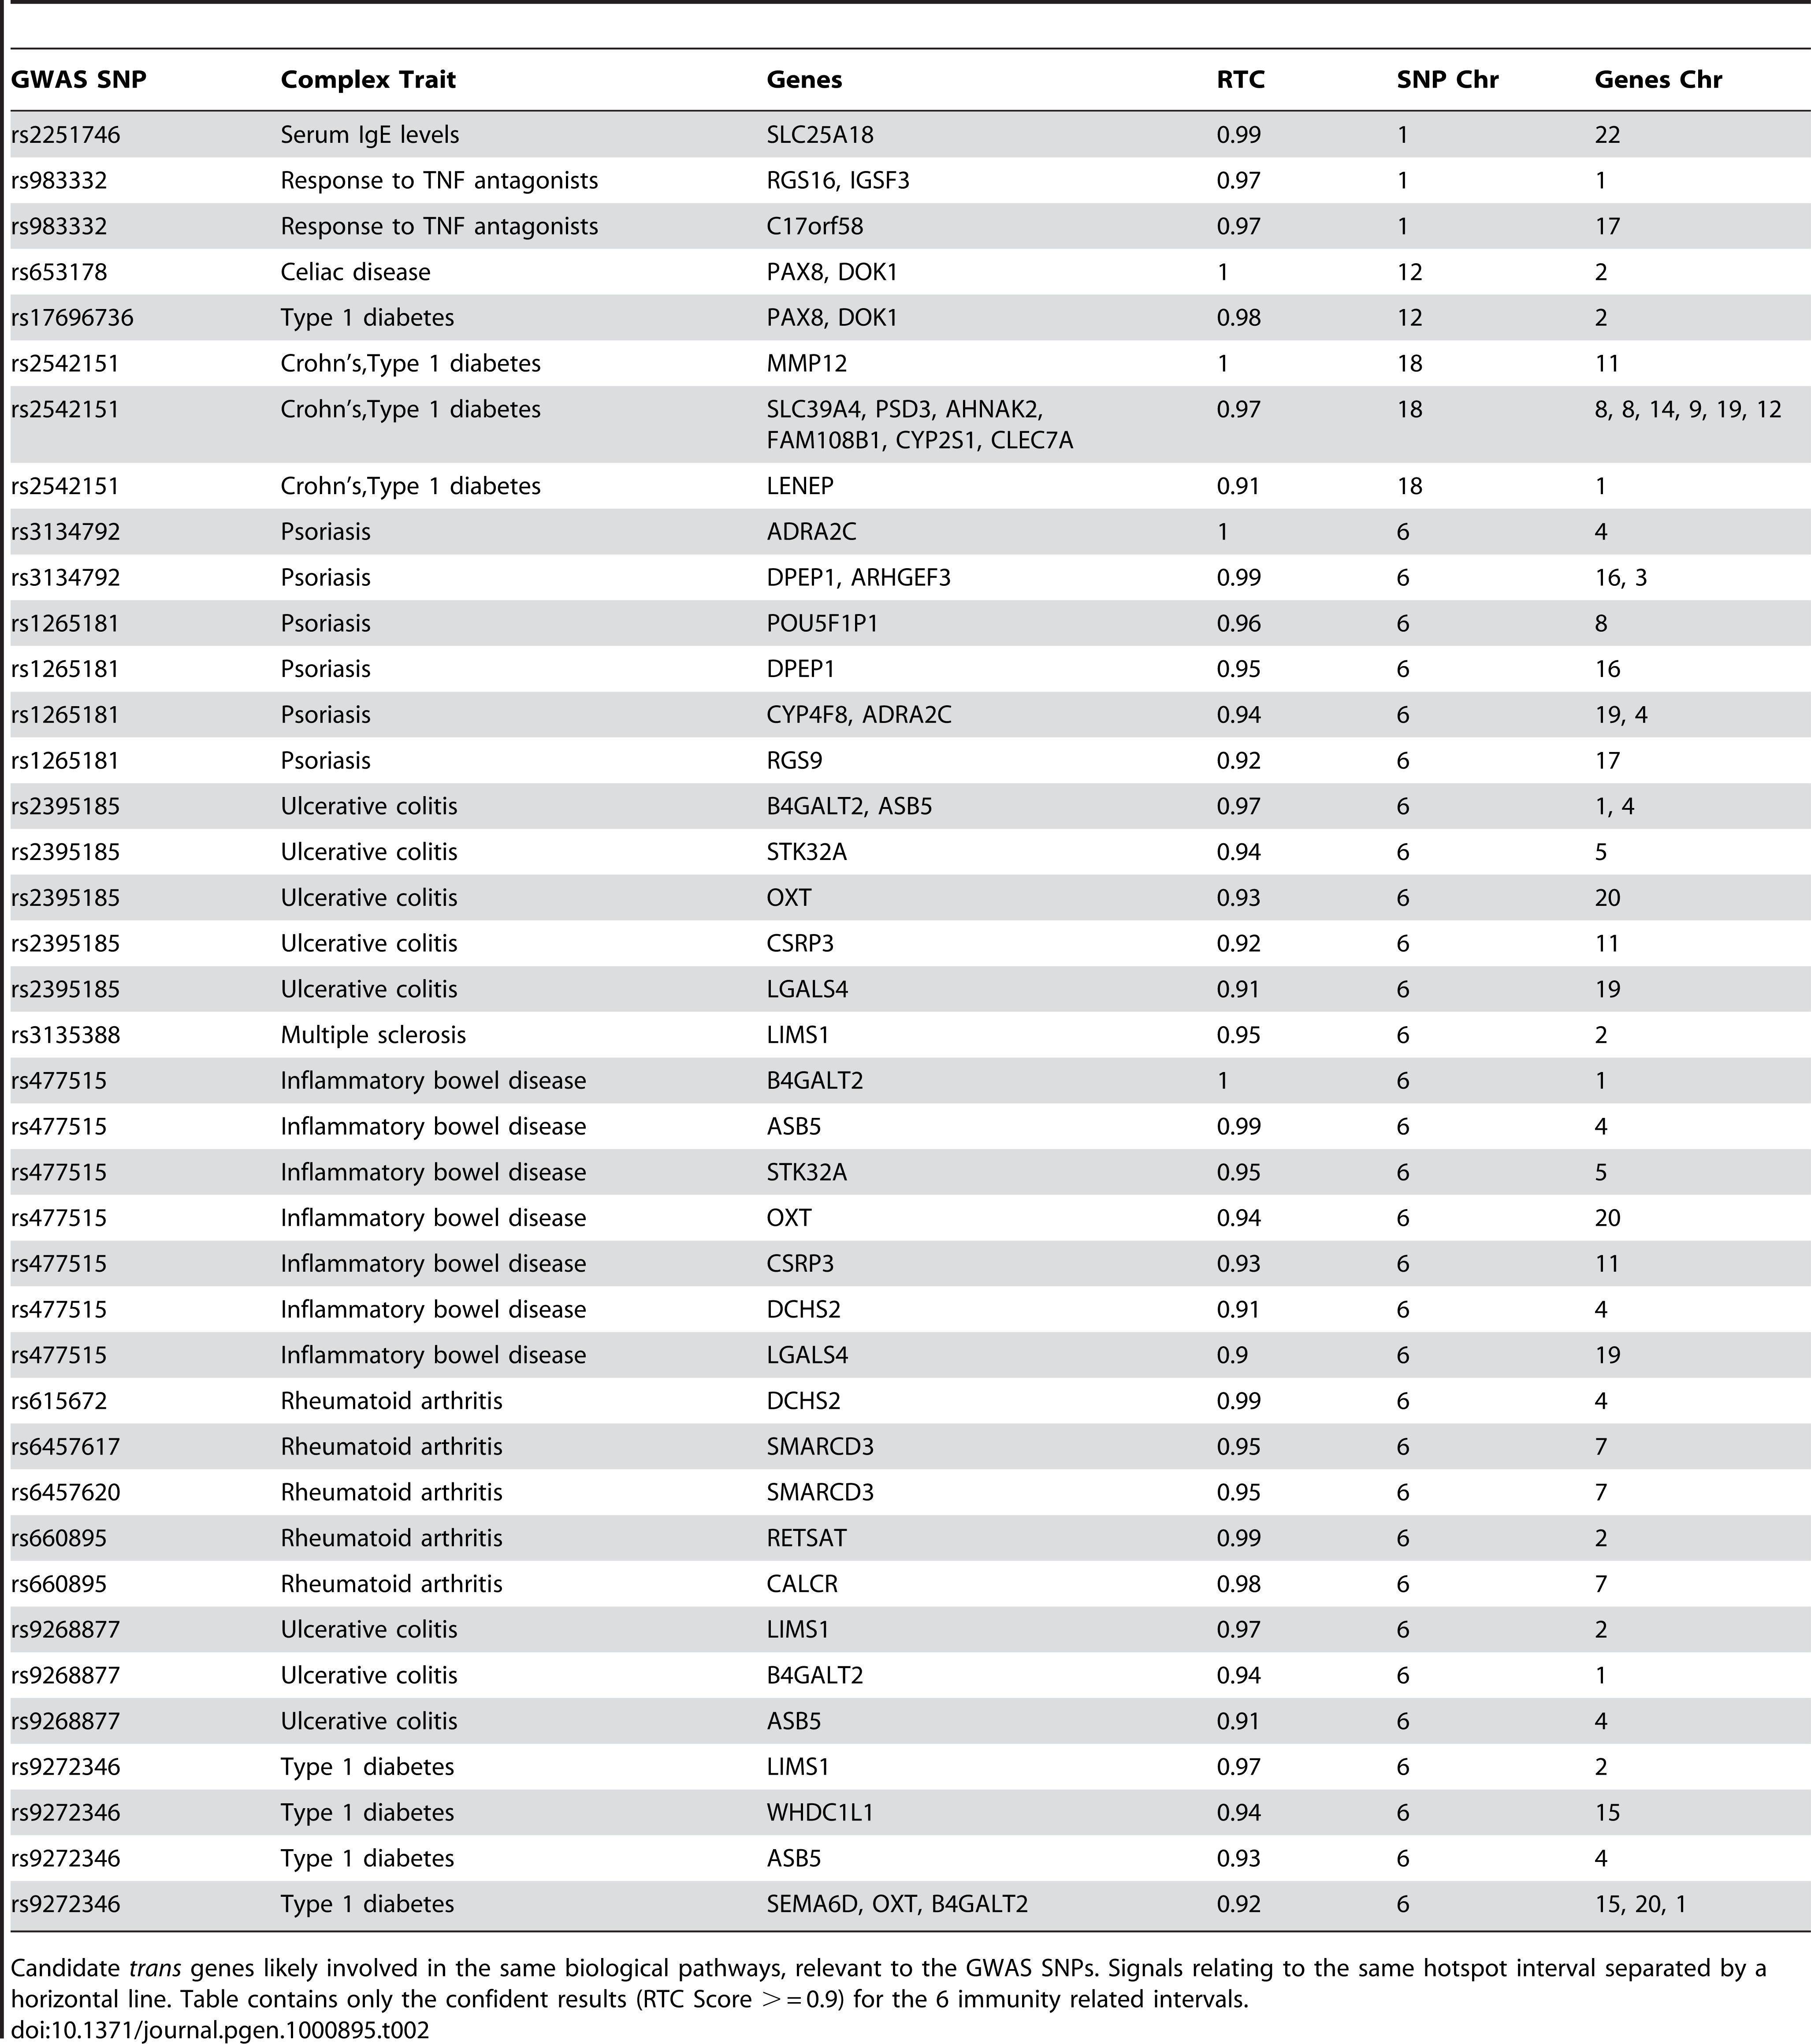 Candidate <i>trans</i> results.